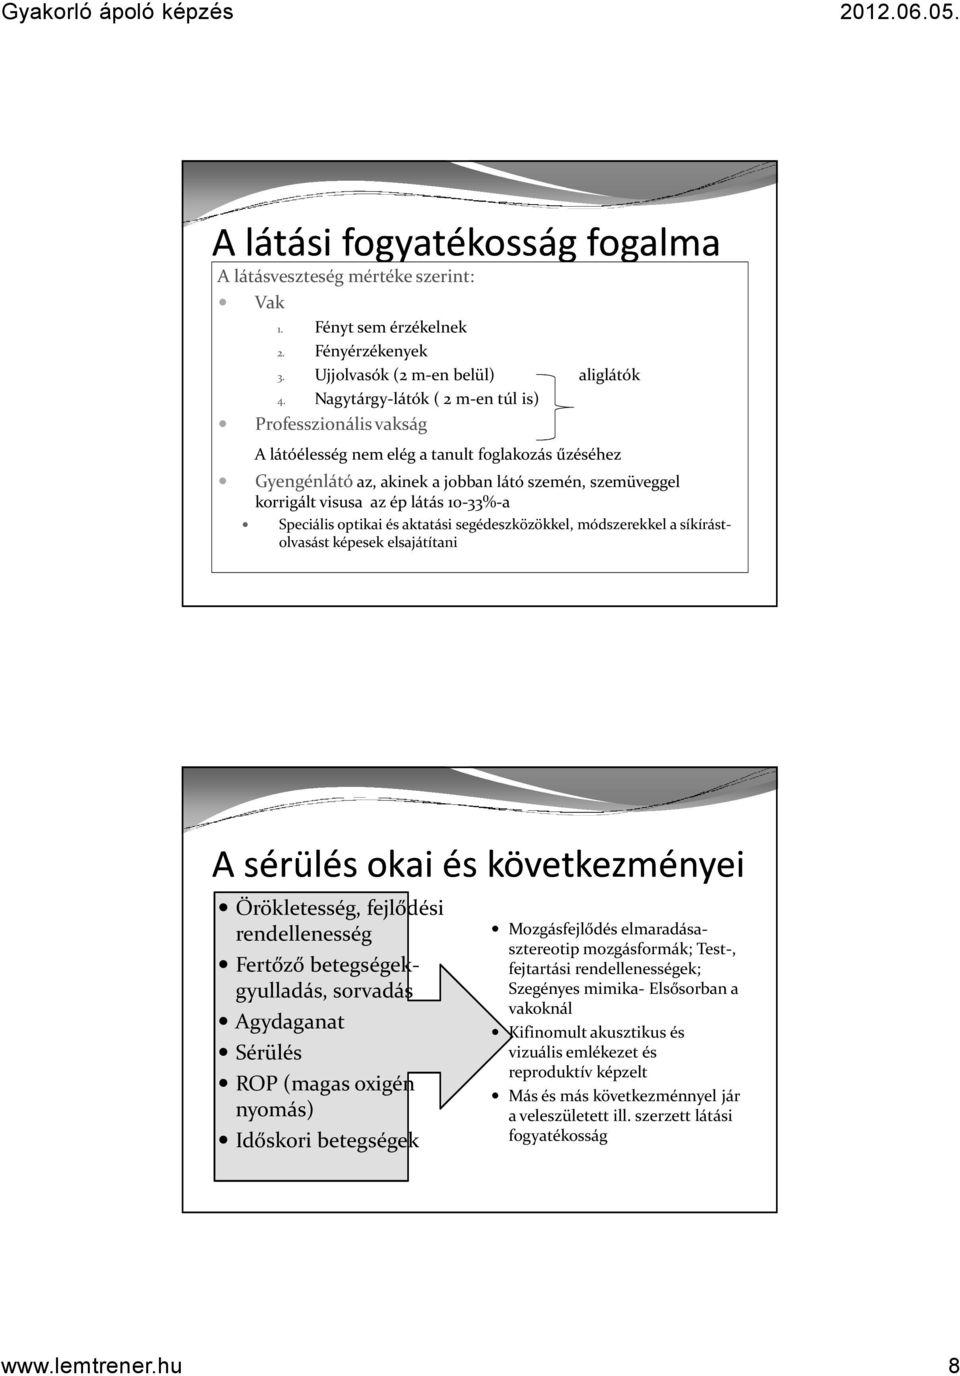 magas vérnyomás 2 típusú fogyatékosság)